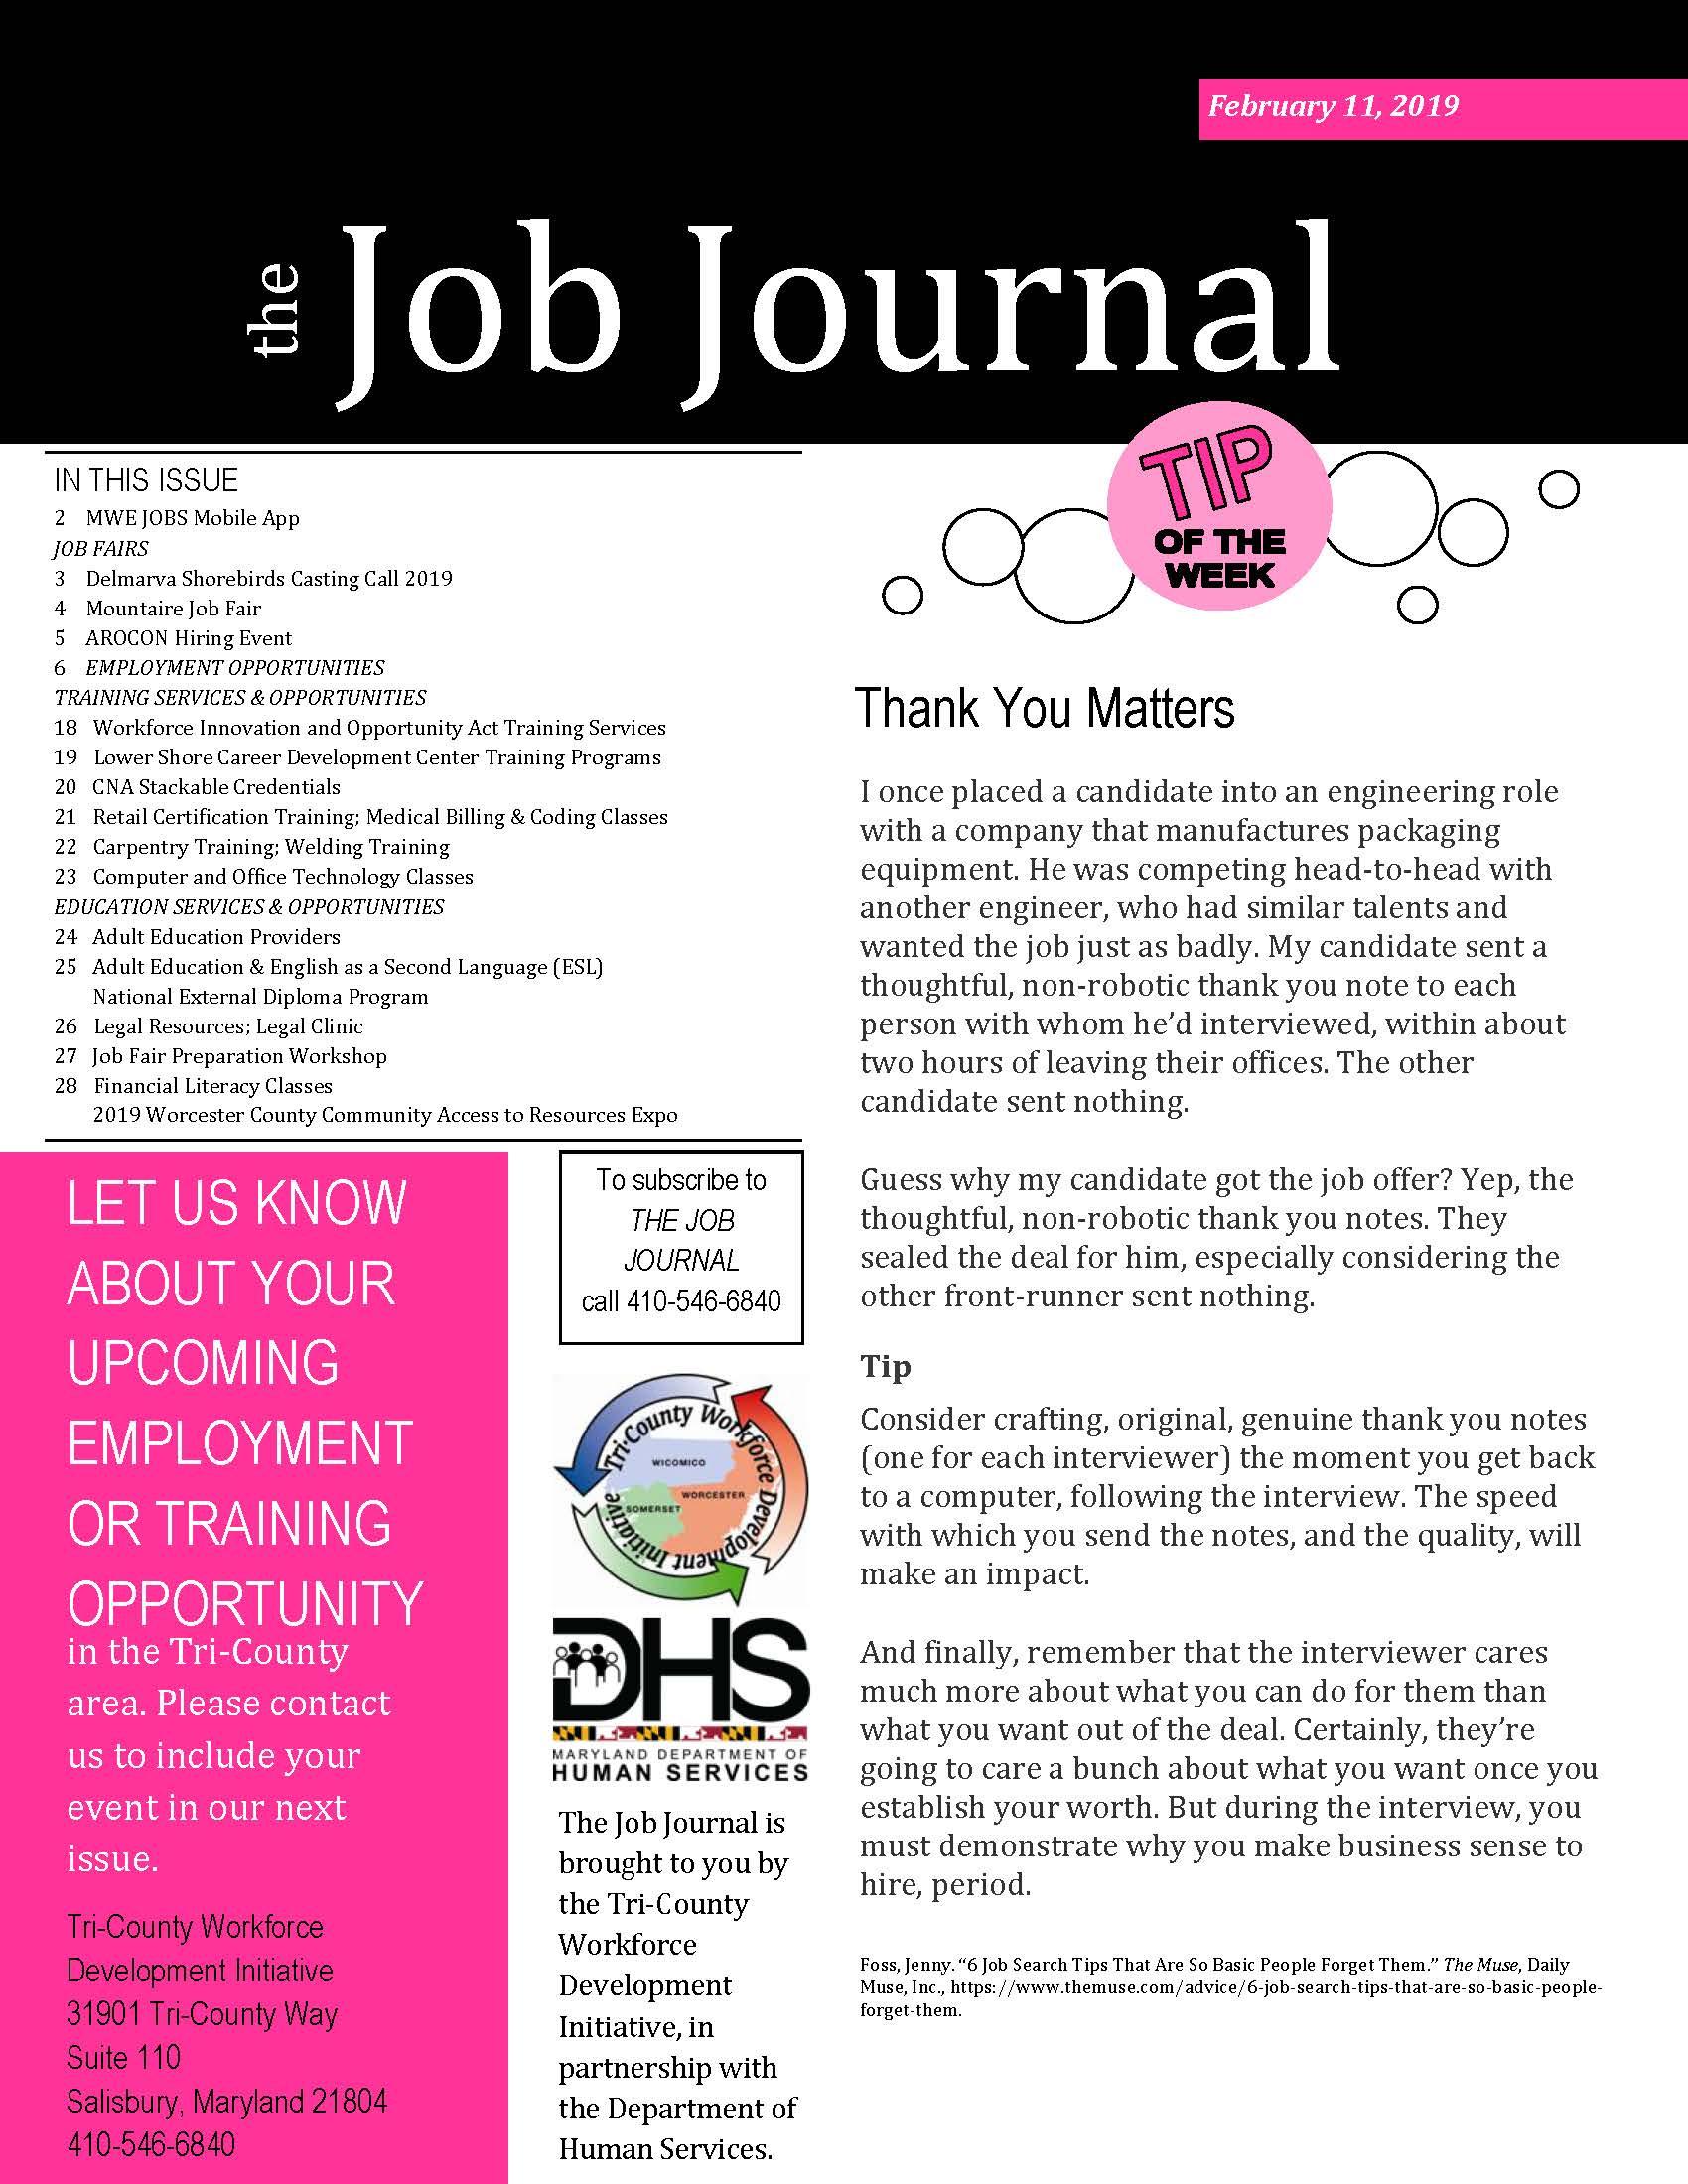 The Job Journal Feb. 11, 2019